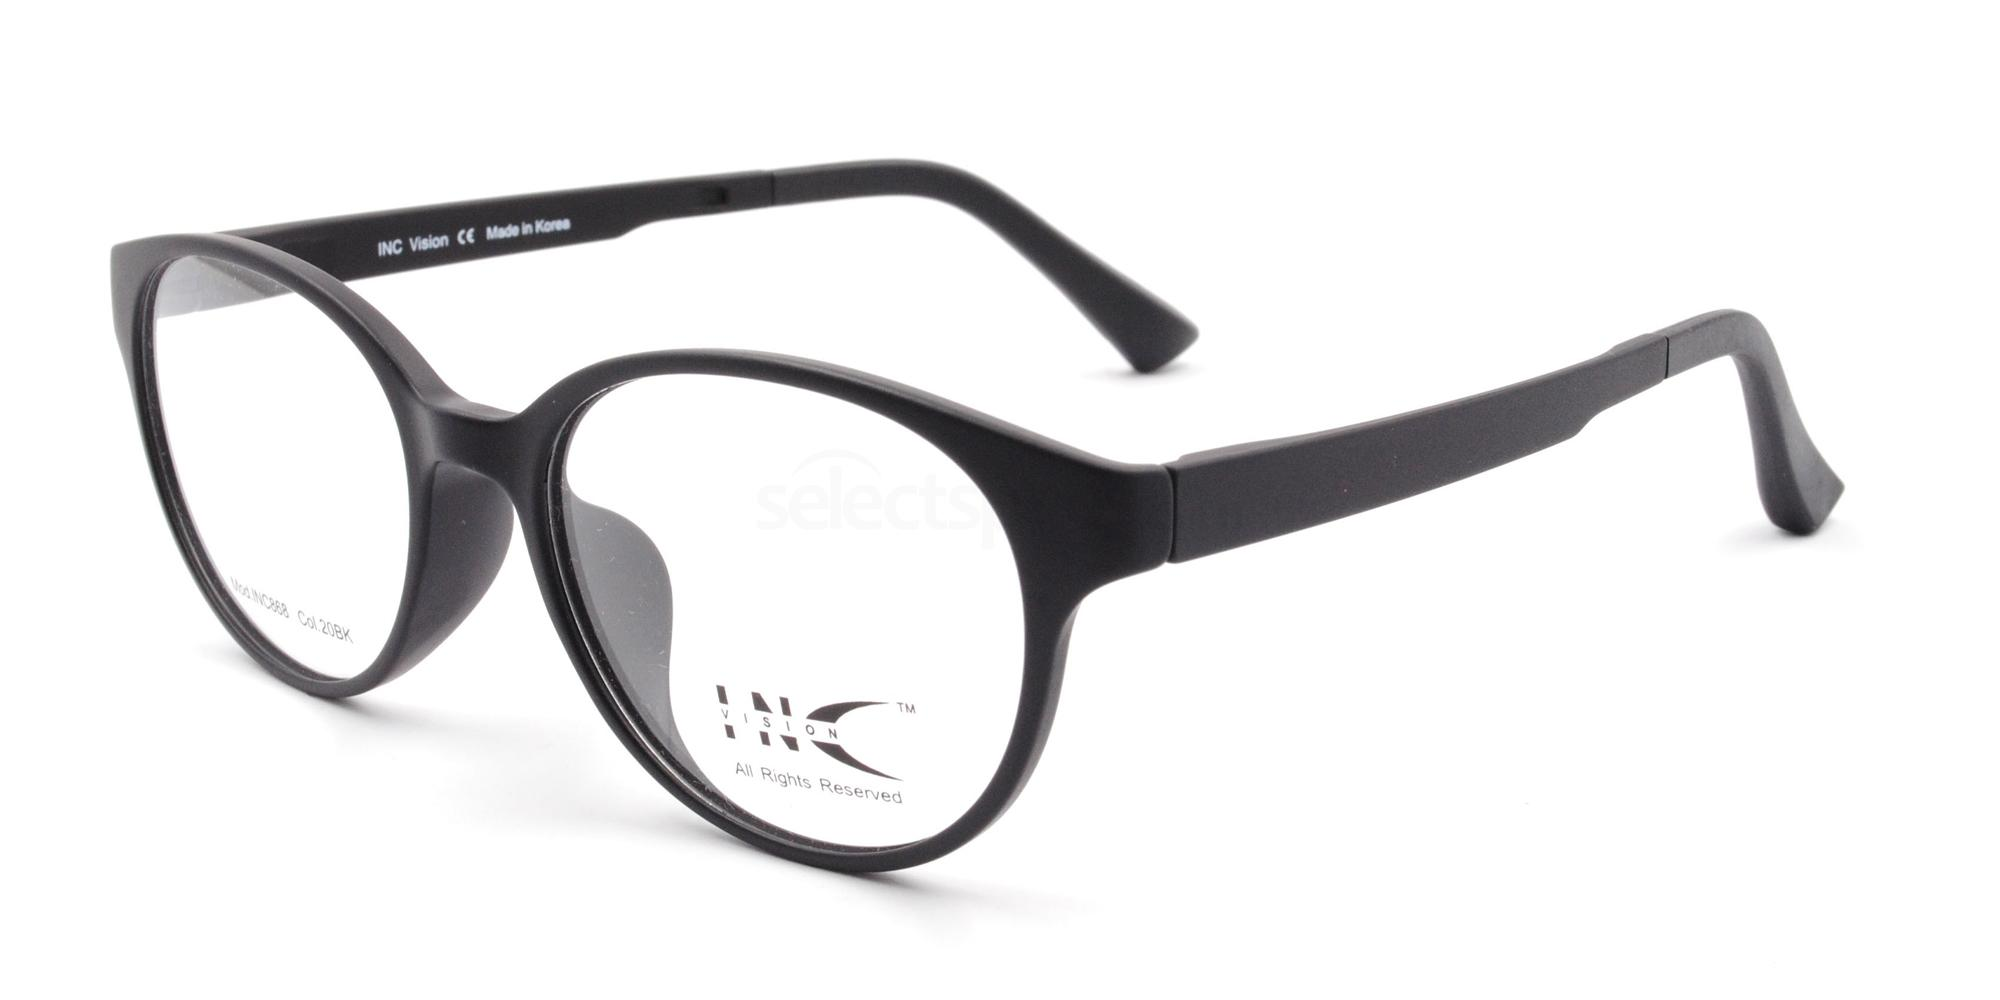 20BK INC 868 Glasses, INC Vision